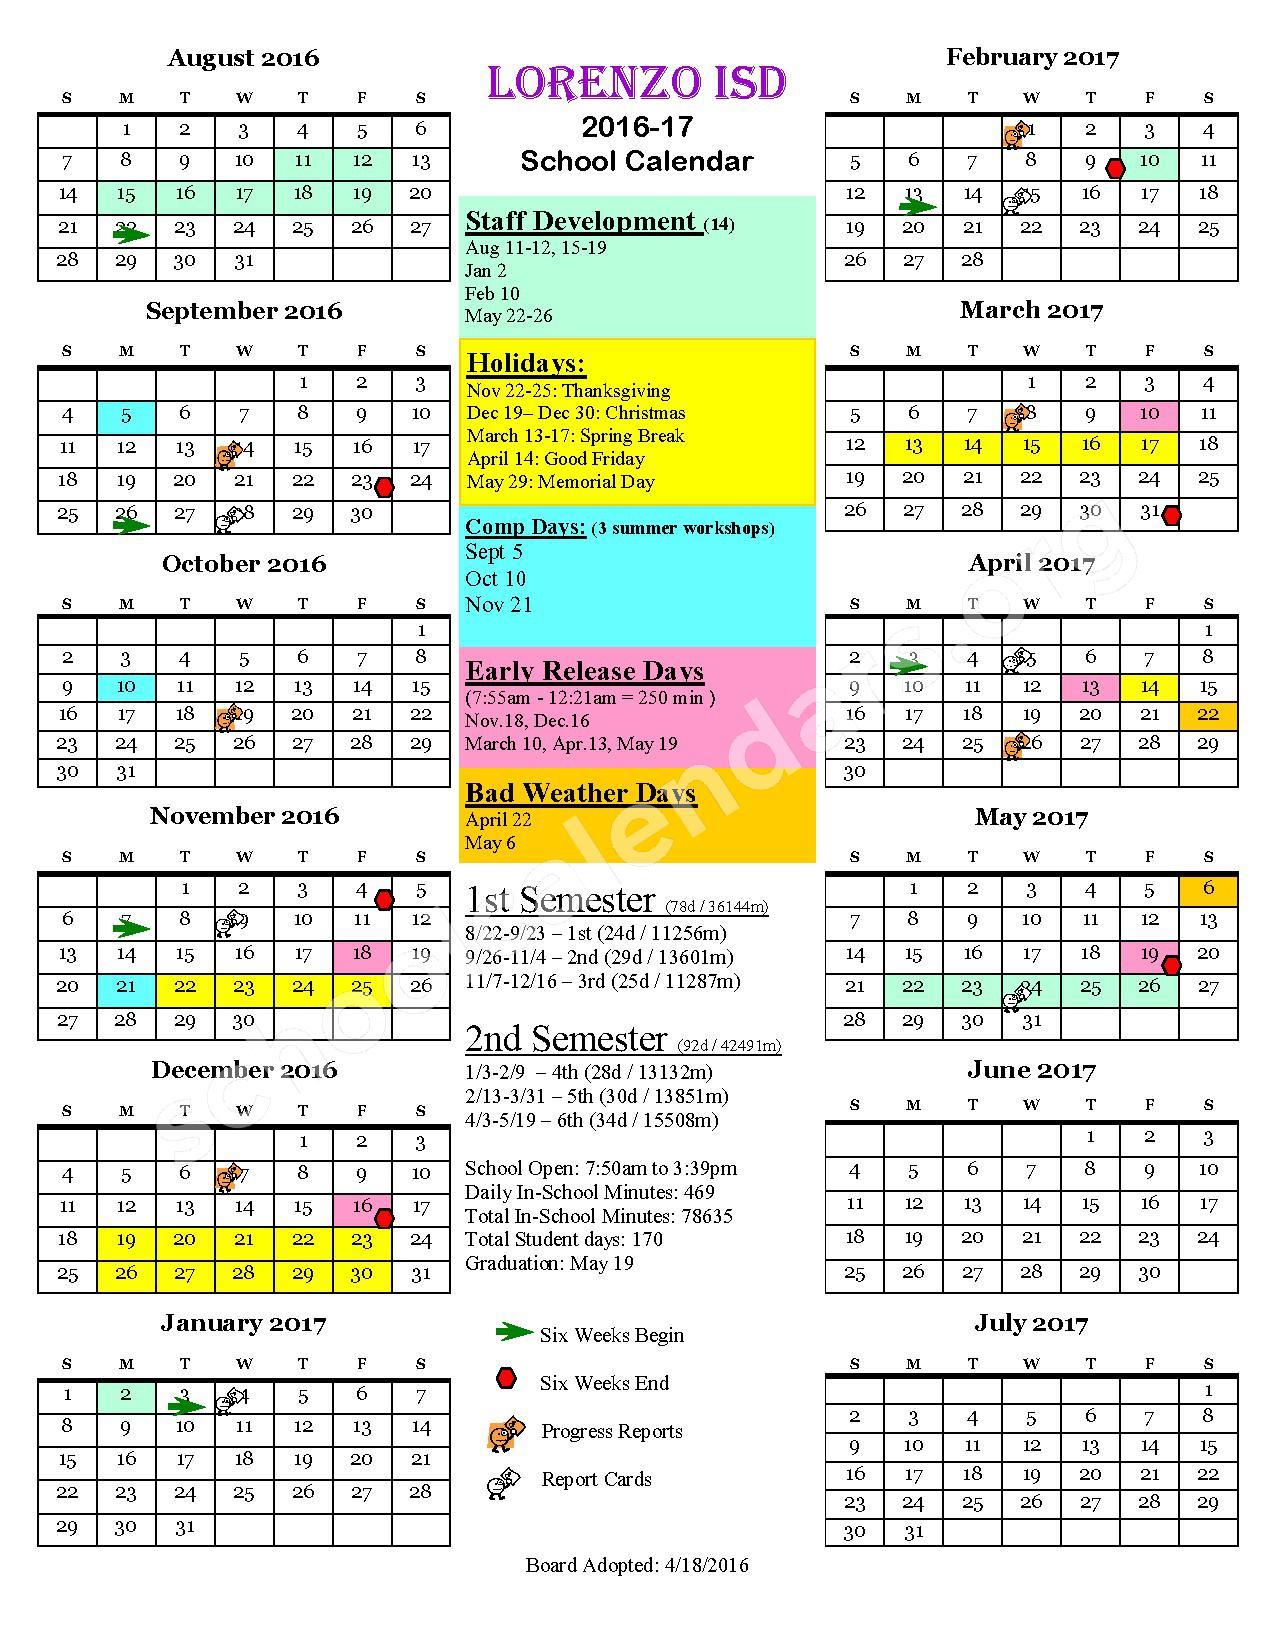 Lorenzo Independent School District Calendars Texas